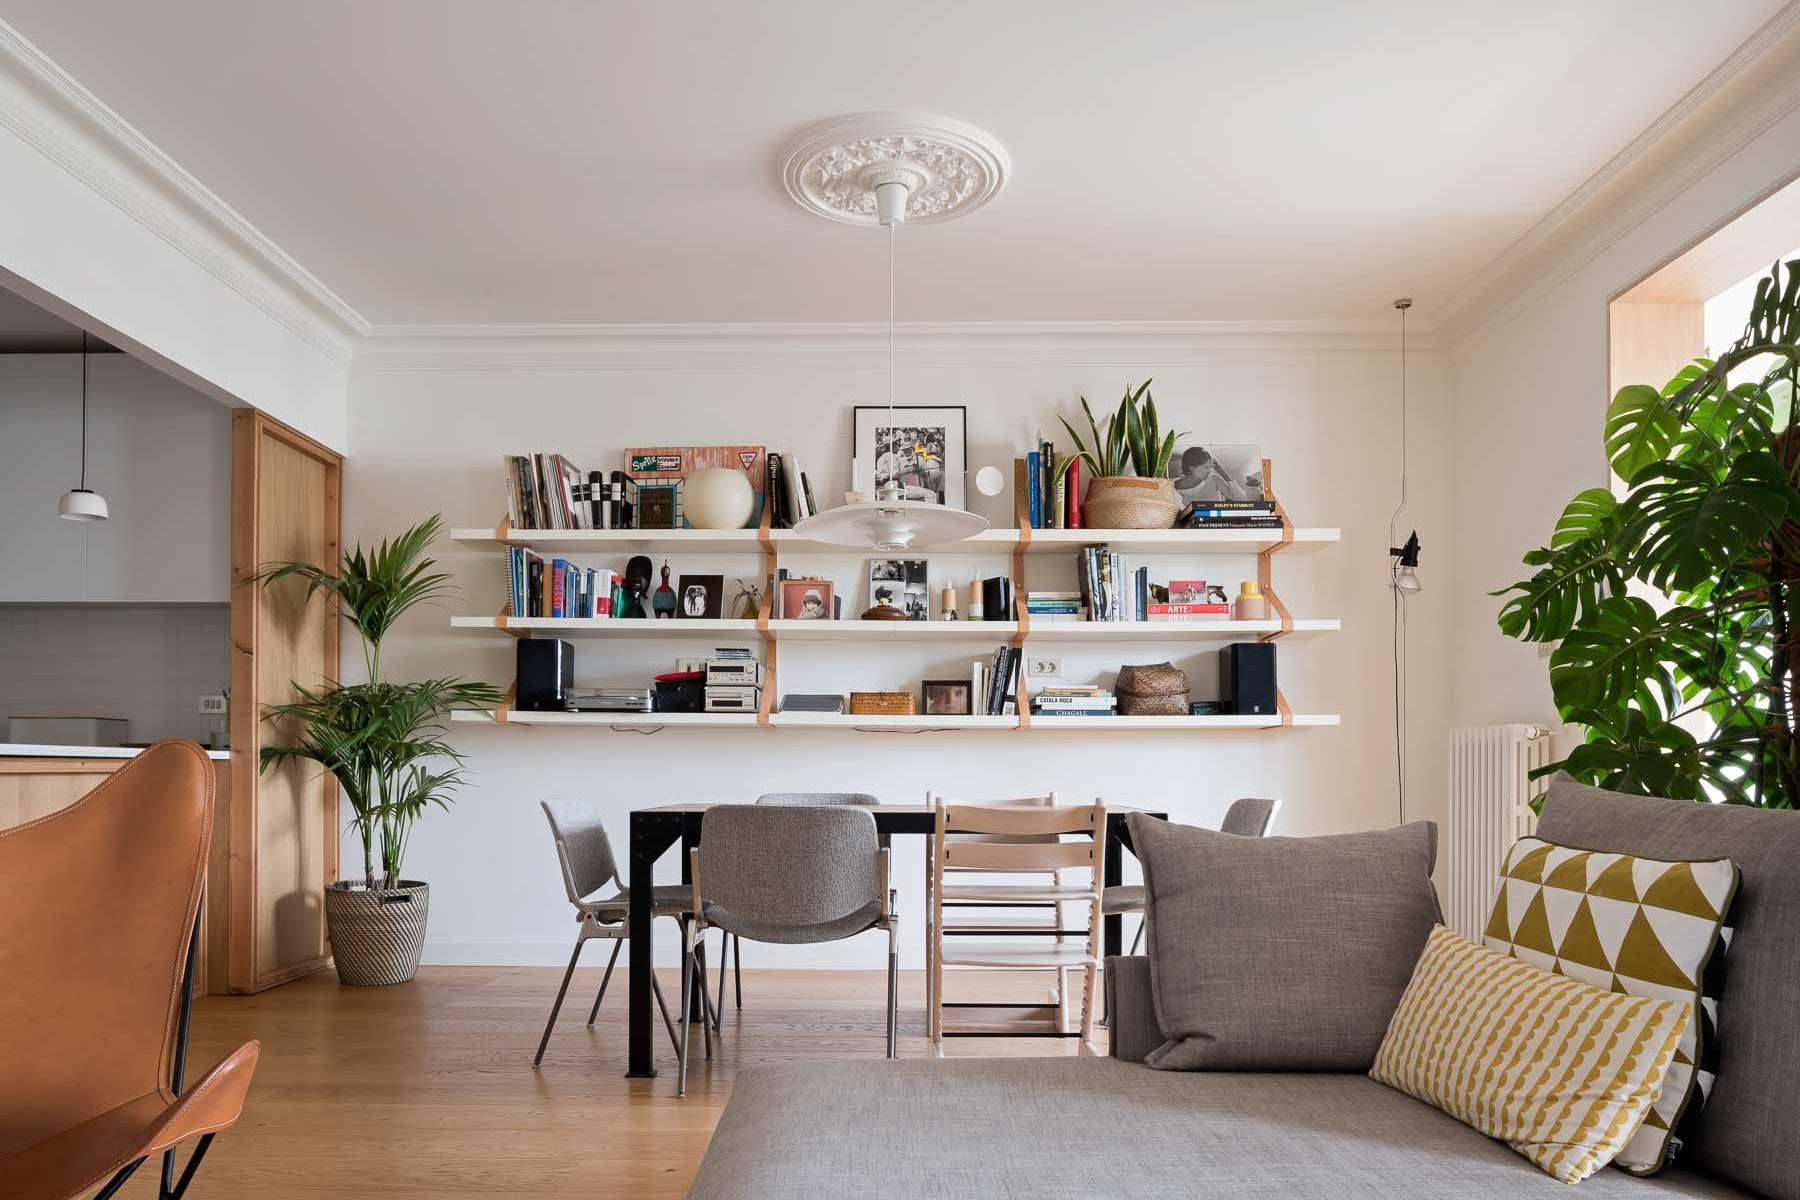 marta alonso diseño de mueble a medida